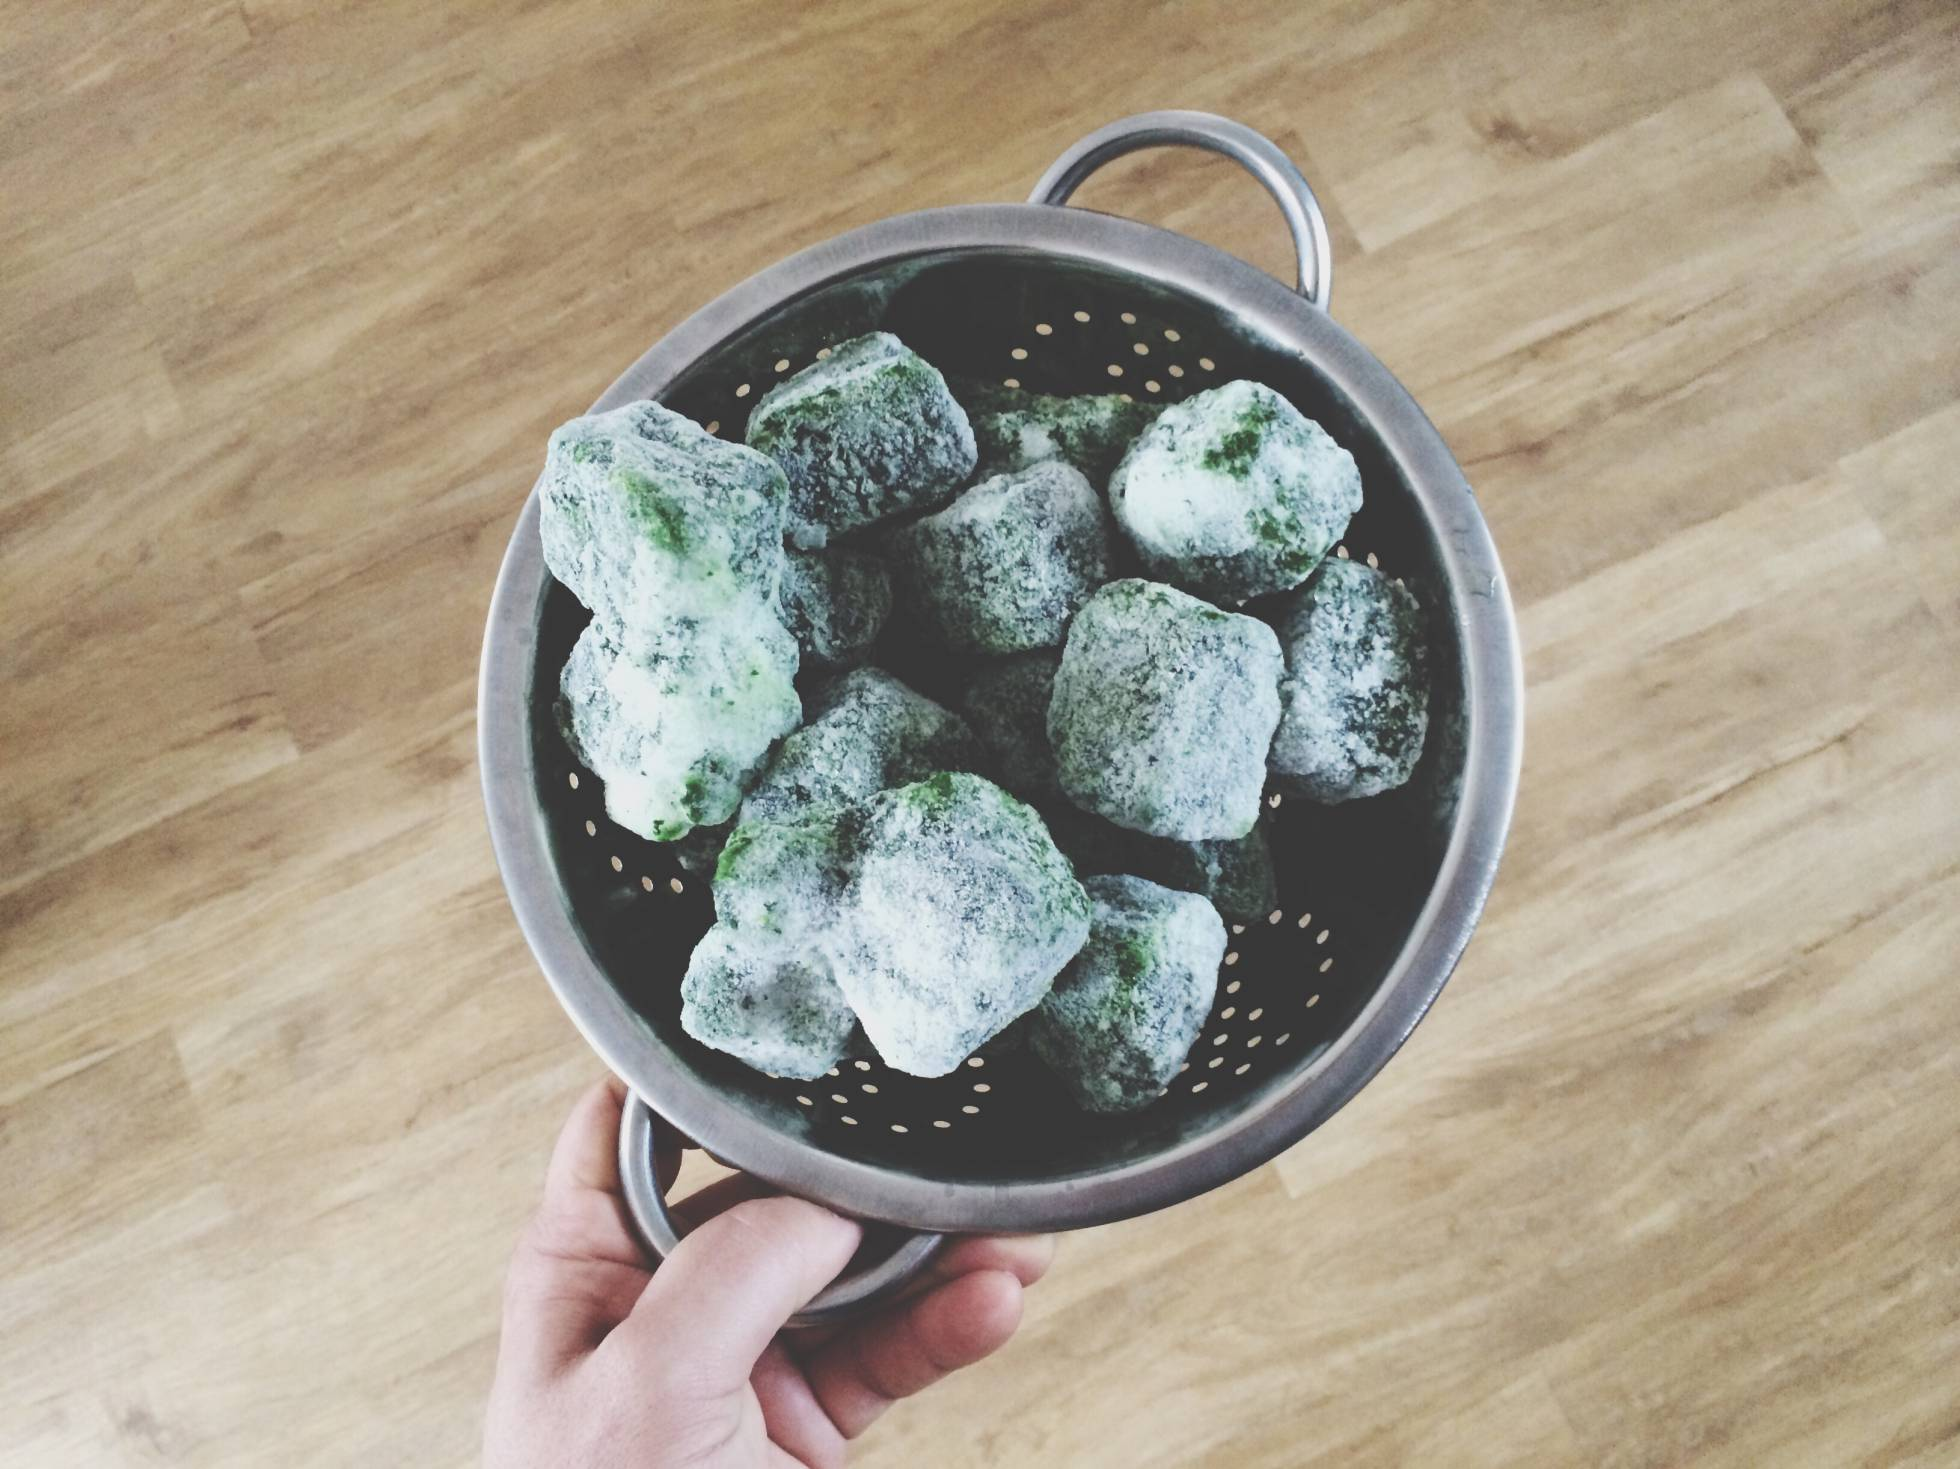 Las verduras congeladas no son sanas, son sanísimas